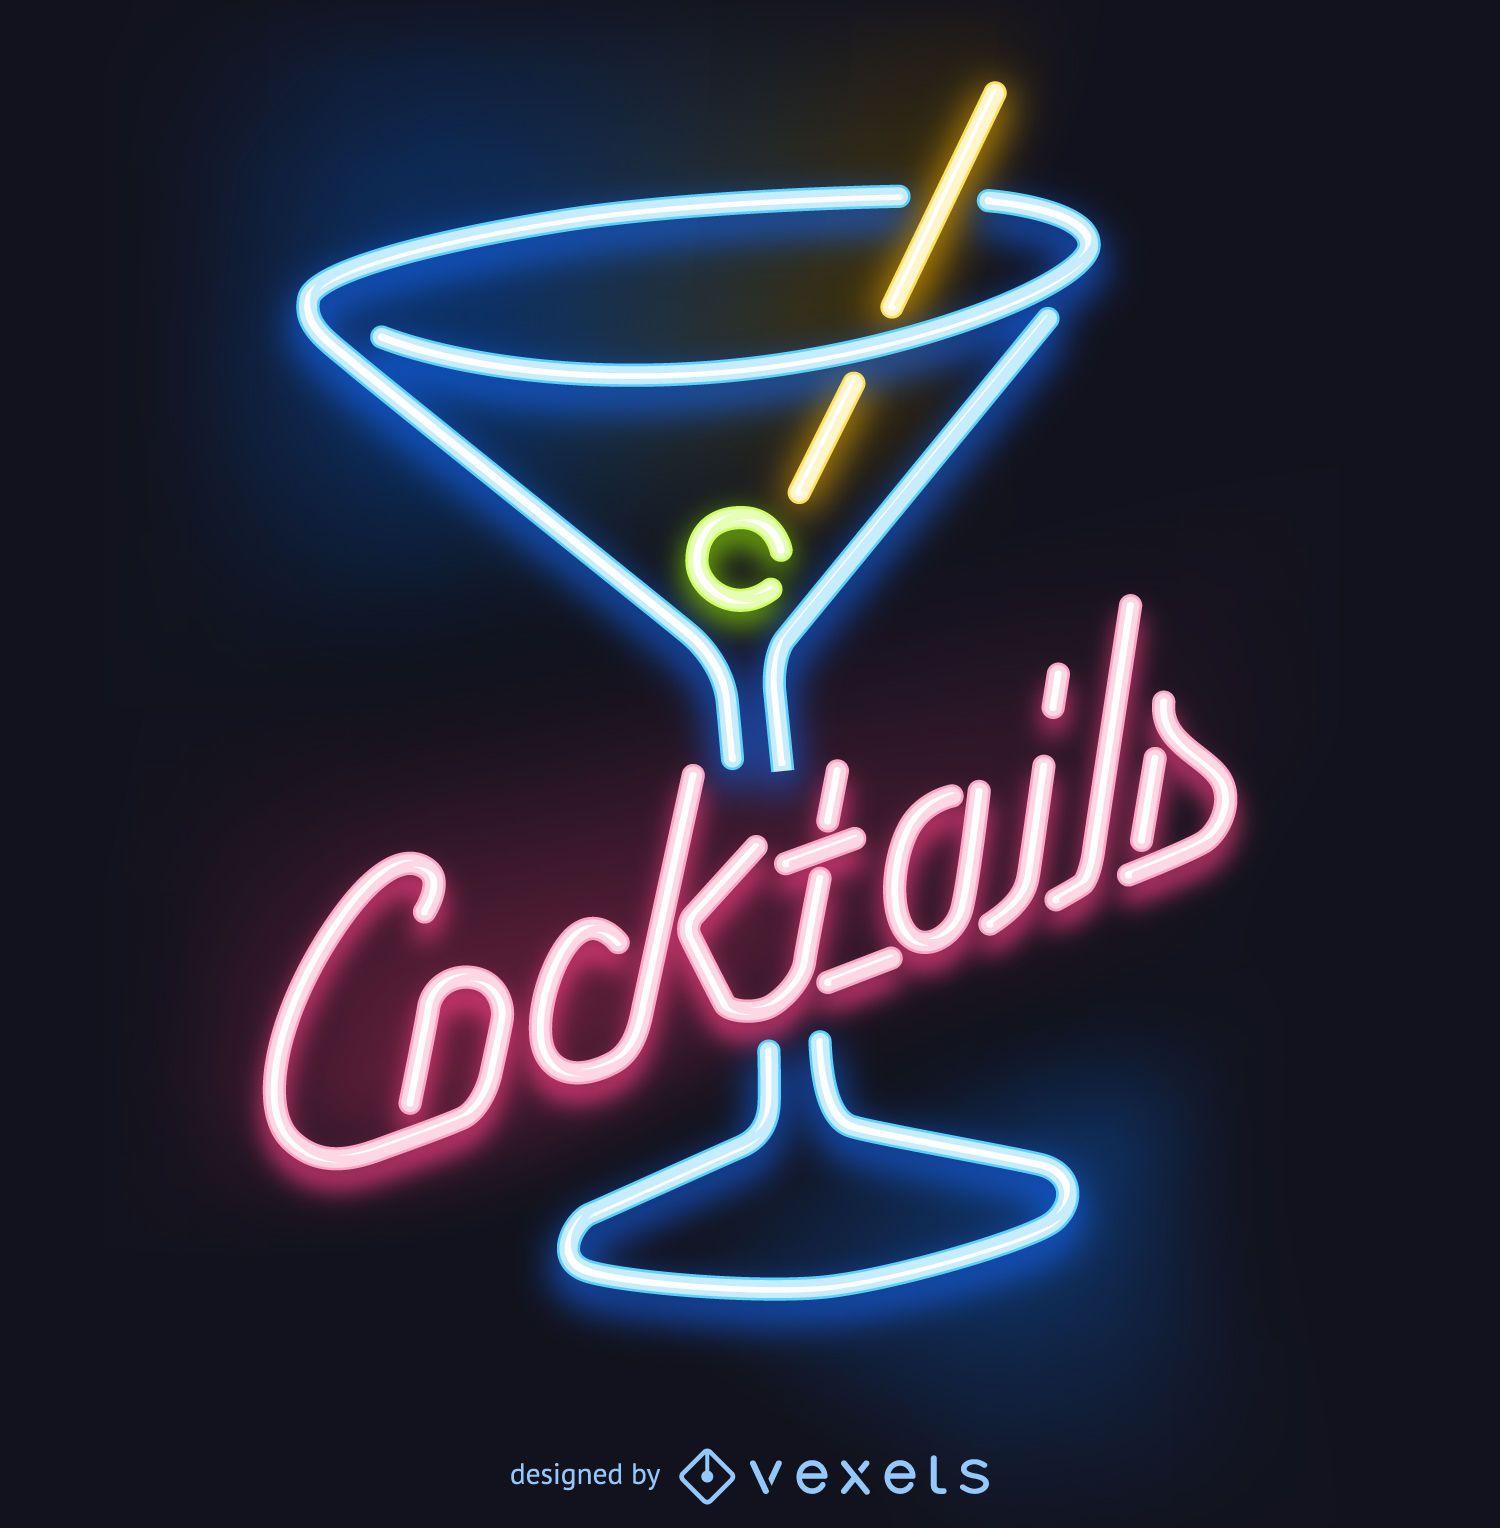 Cocktails Leuchtreklame